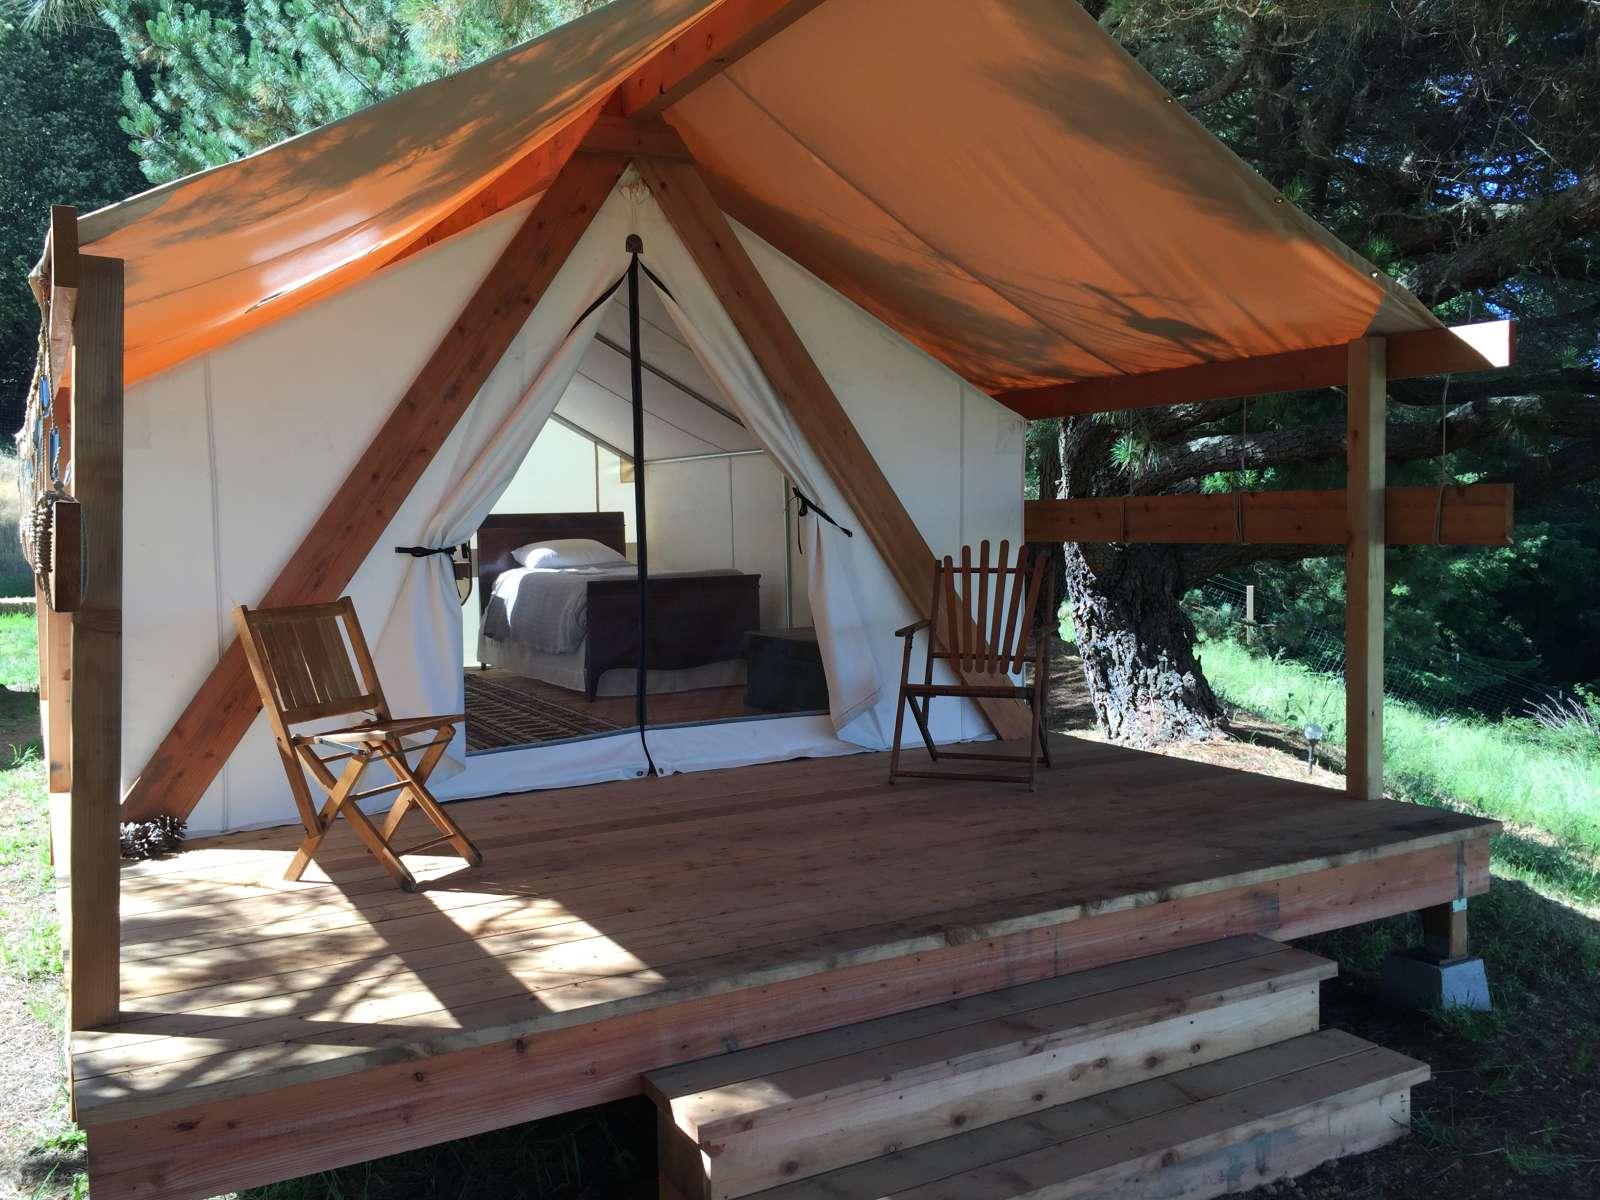 Glamping Tents, Vistas & Stars